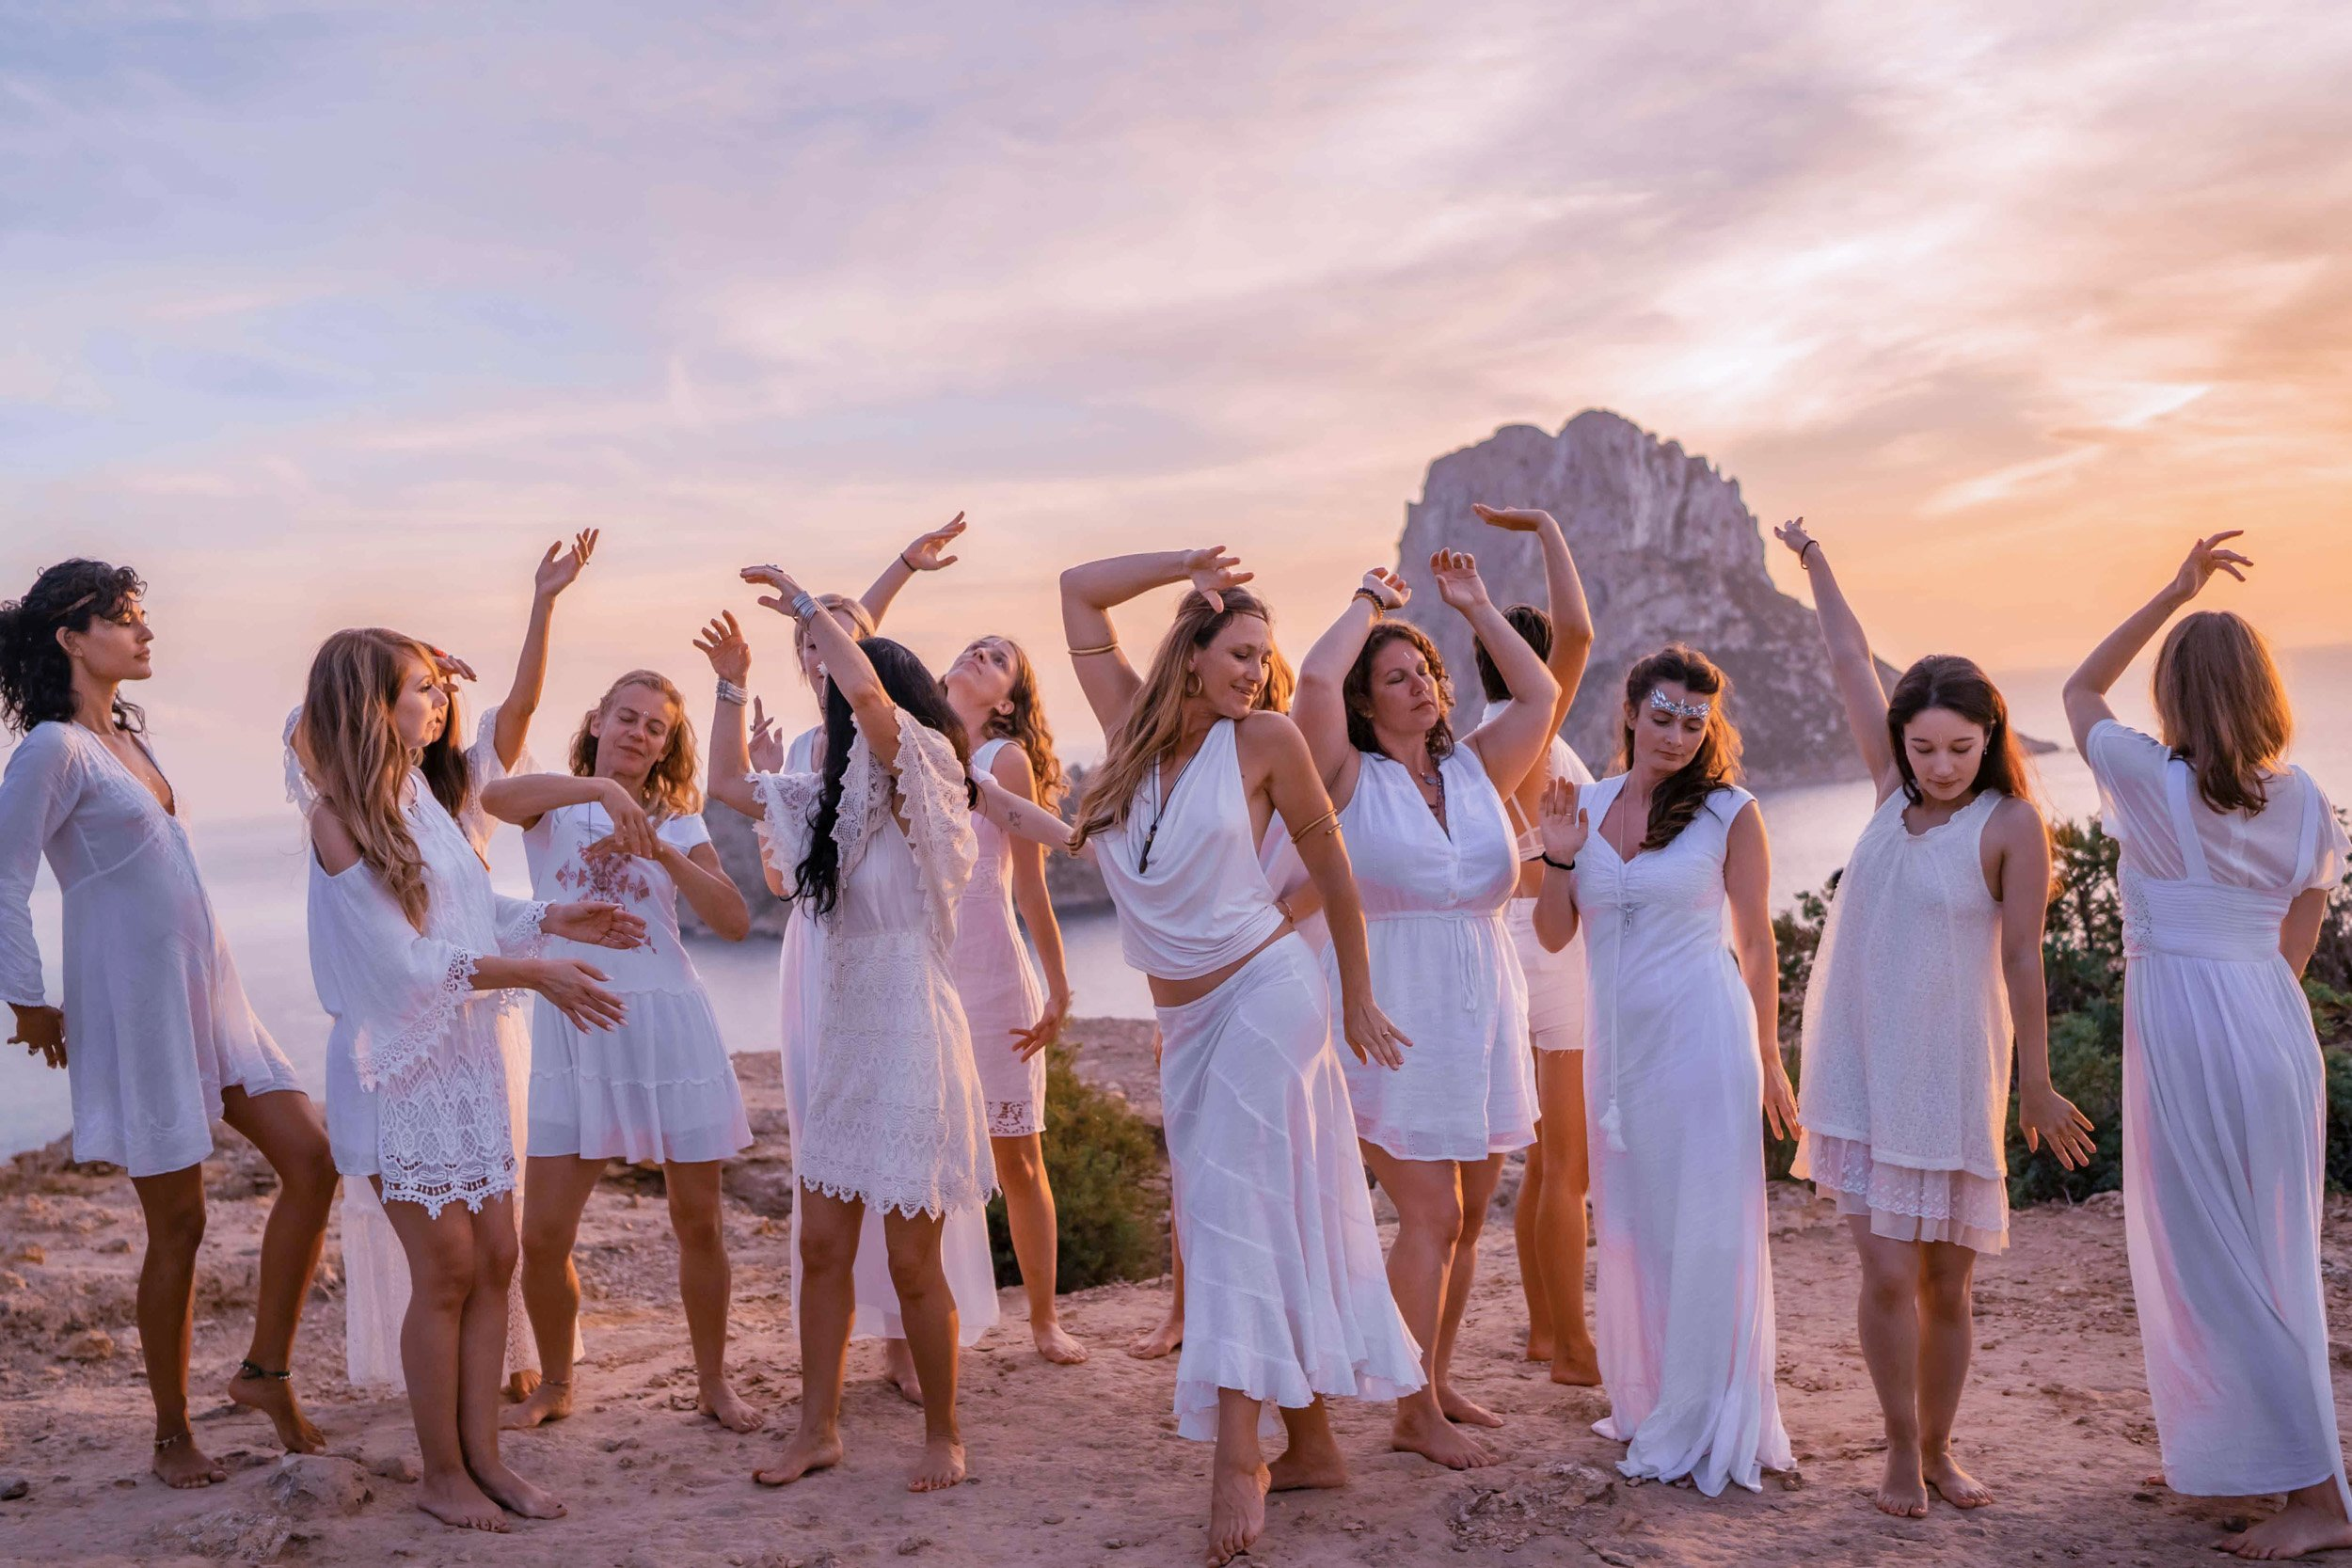 jodie-louise-photoshoots-films-videos-retreats-wrkshops-spiritual-yoga-19